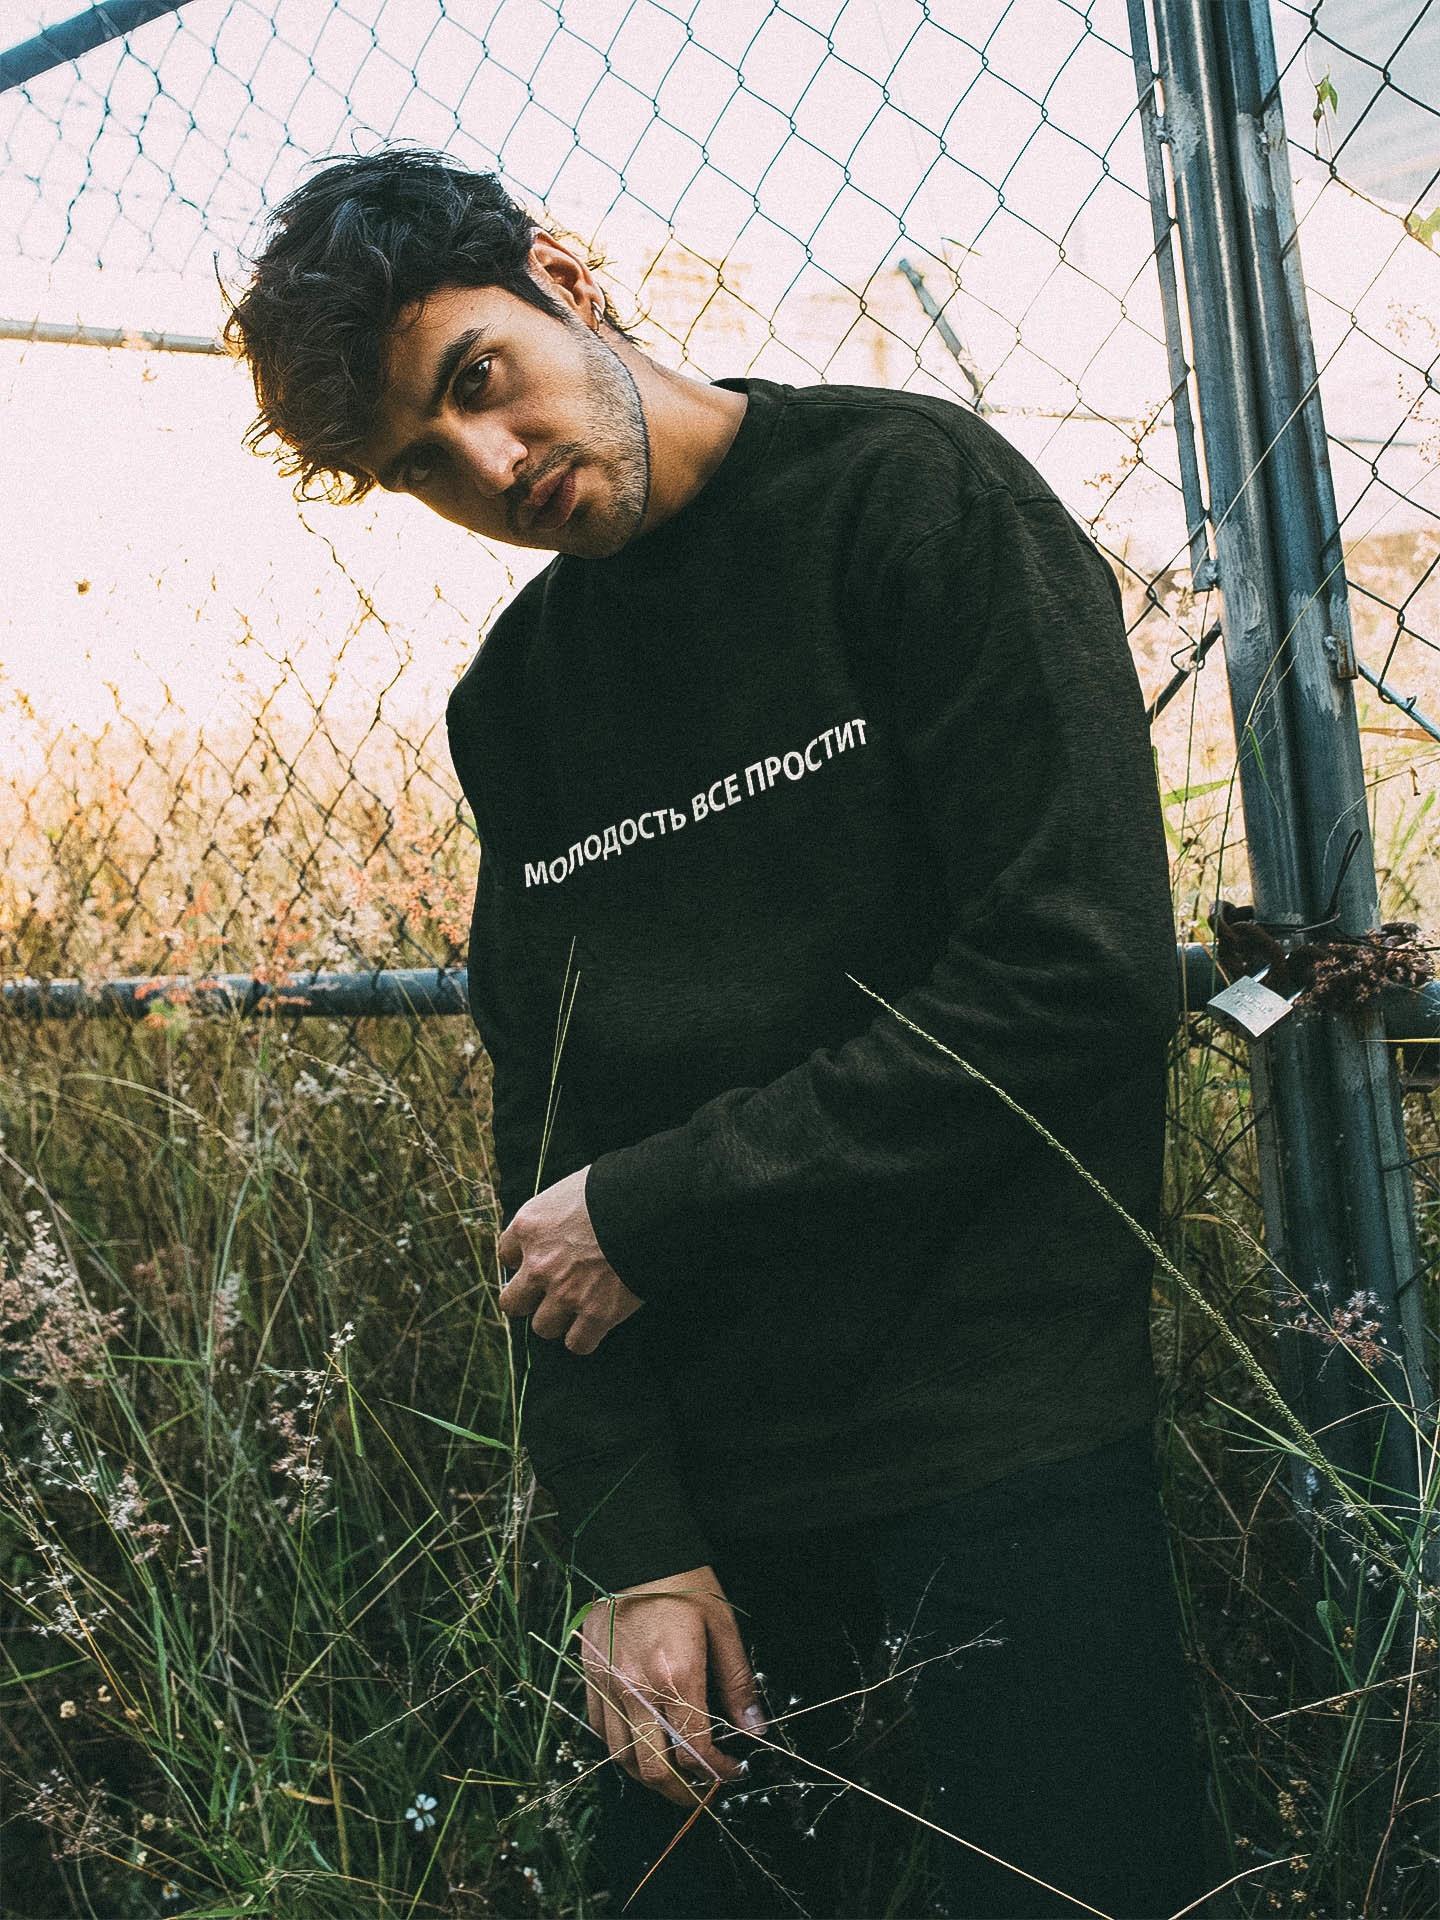 Gençlik olacak Forgive her şey rus yazıtlar Hoodies Streetwear kazak erkekler moda Hip Hop Hoodie kazak Hoody